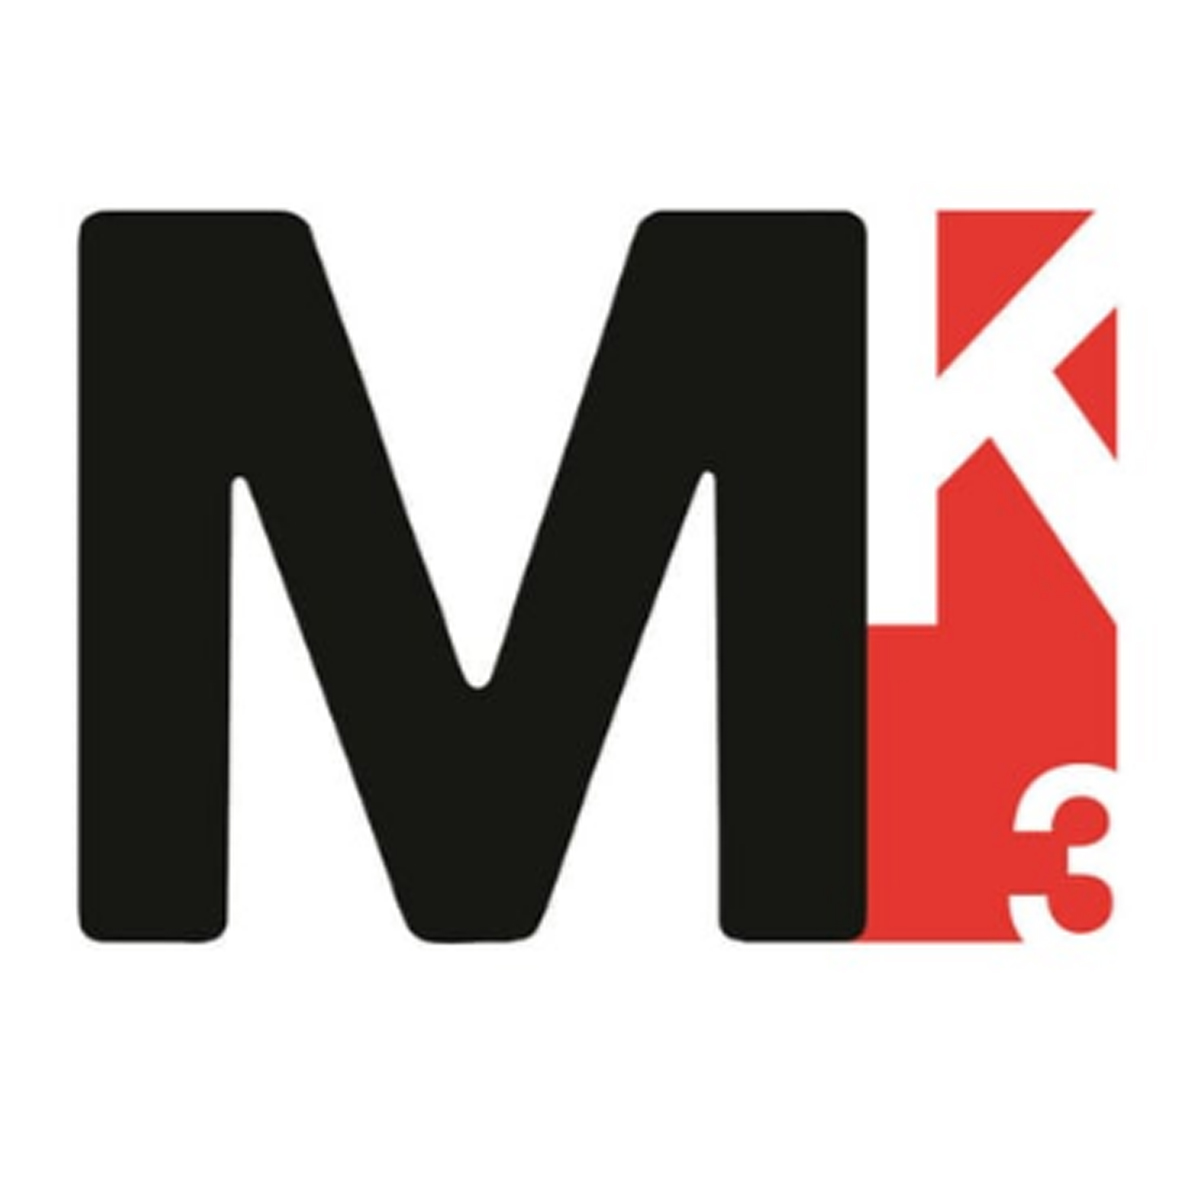 MK3Sq.jpg